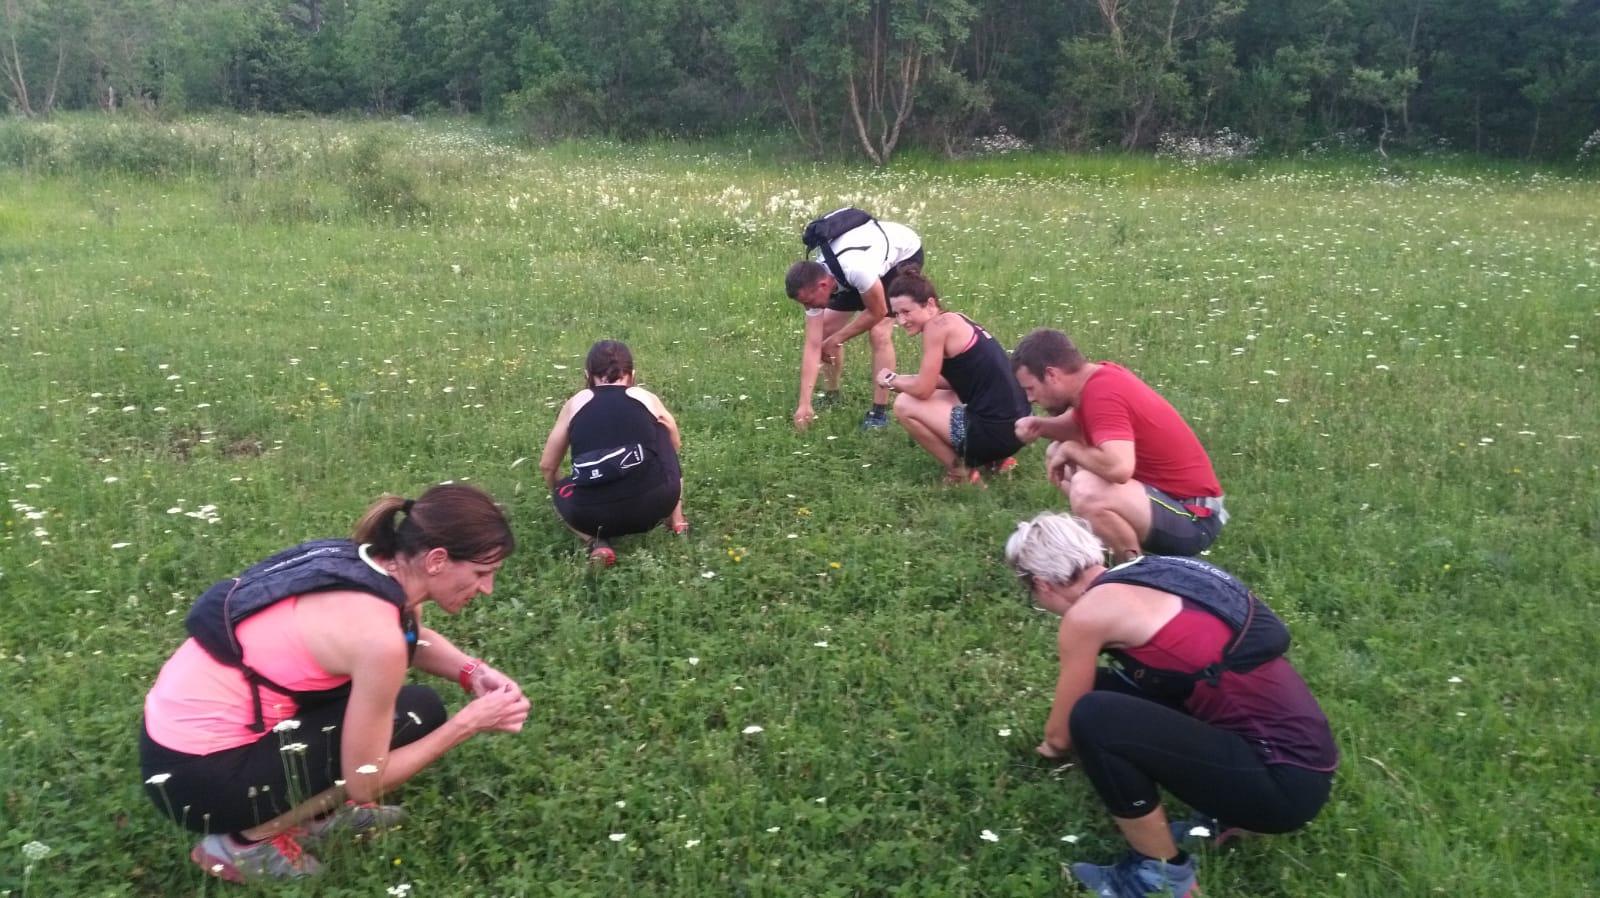 Trenutno pregledavate 2. trening: Berba šumskih jagoda..